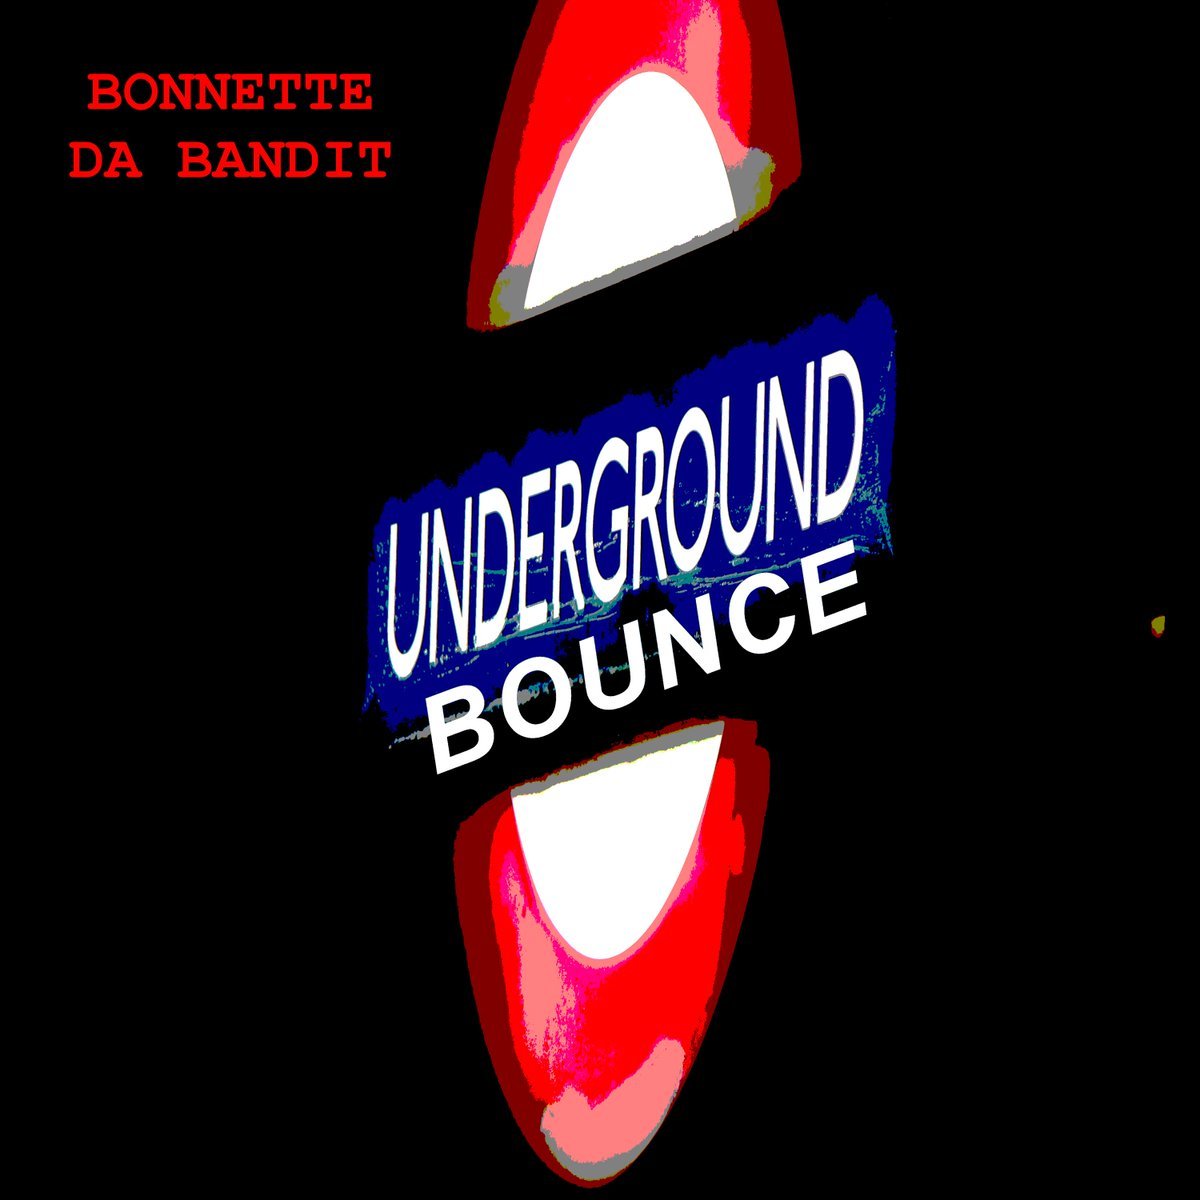 https://amu.se/share/album/bonnette-underground-bounce…  #SaturdayMorning